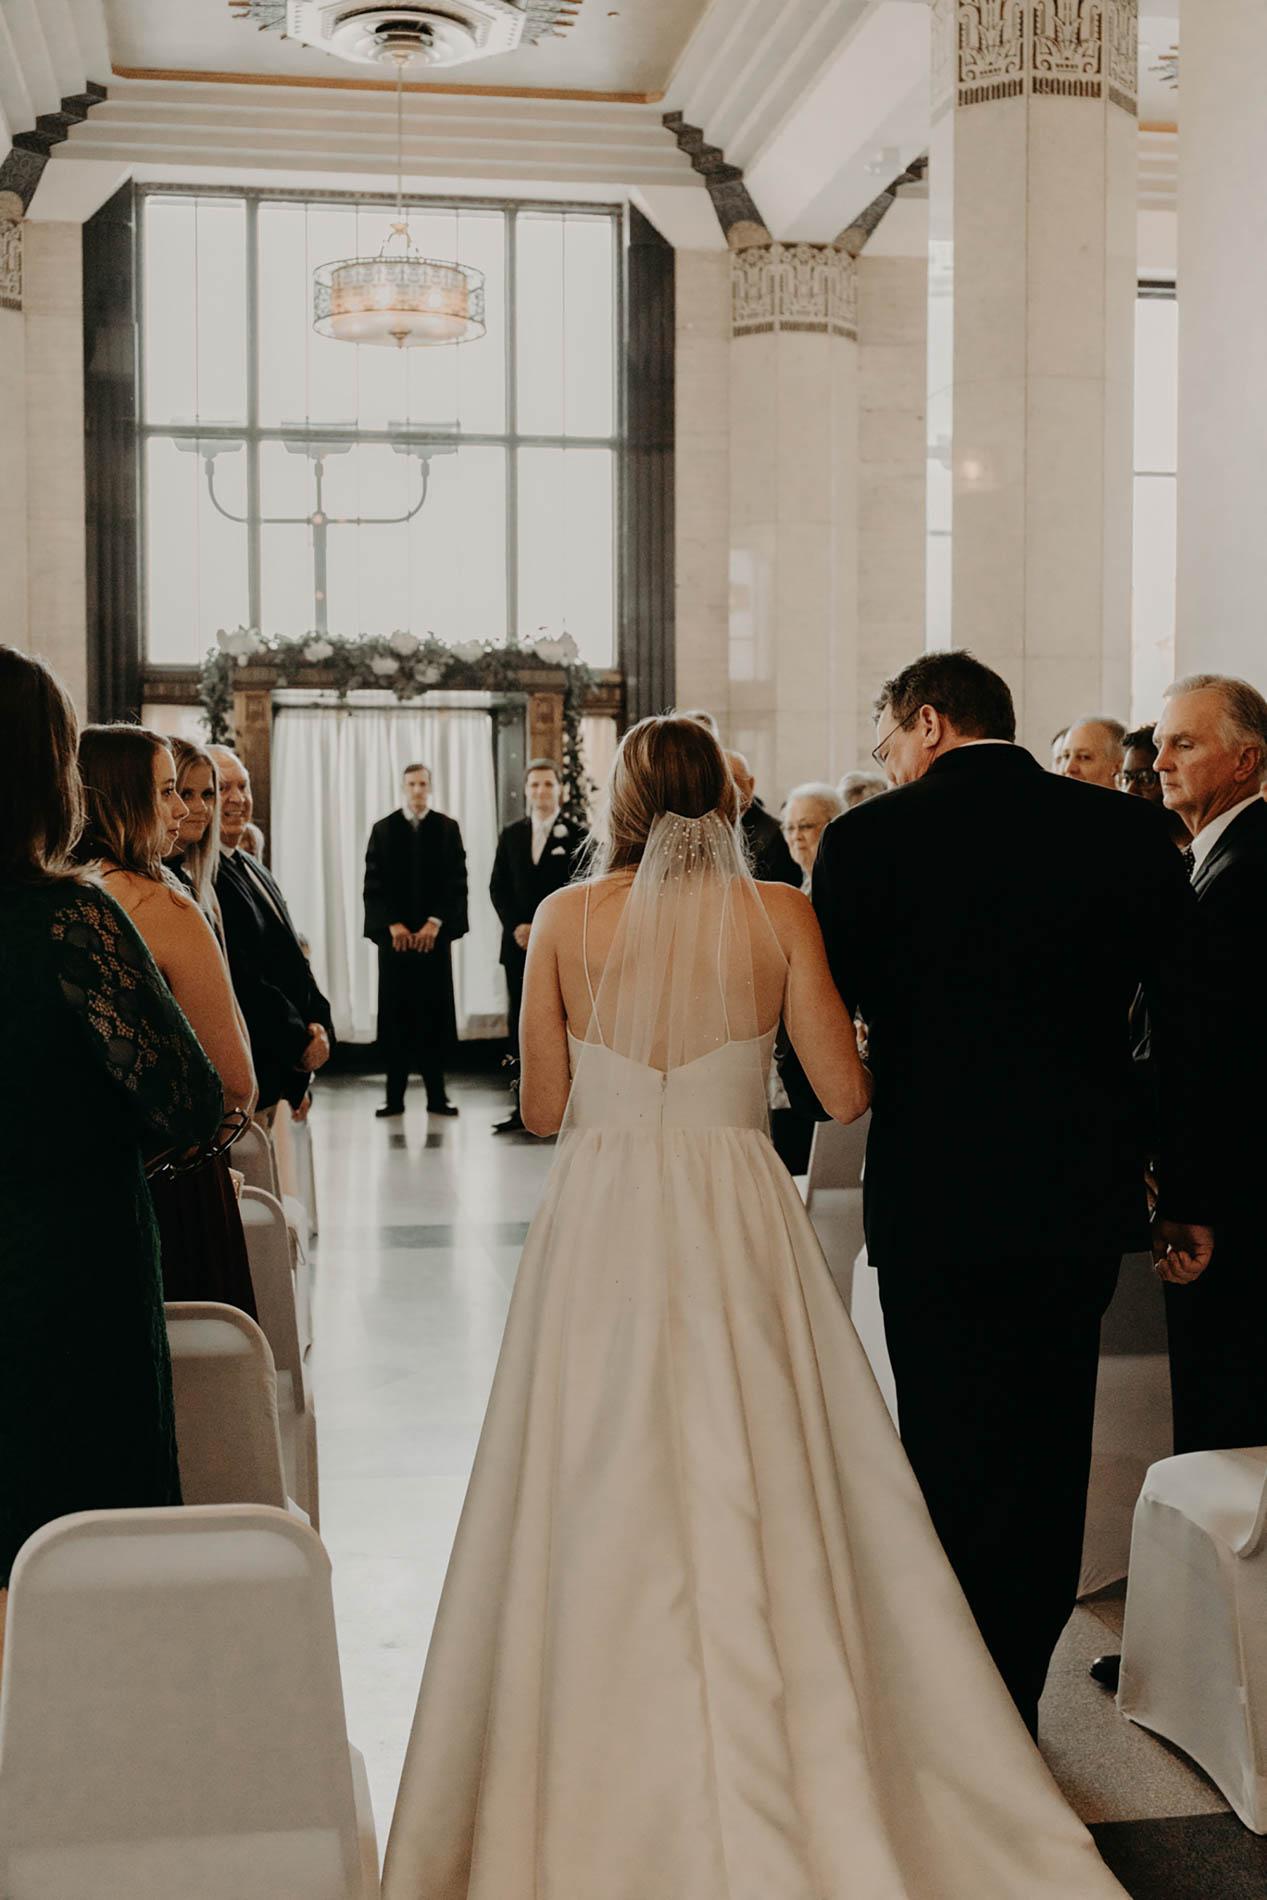 bride walking down aisle towards groom on wedding day